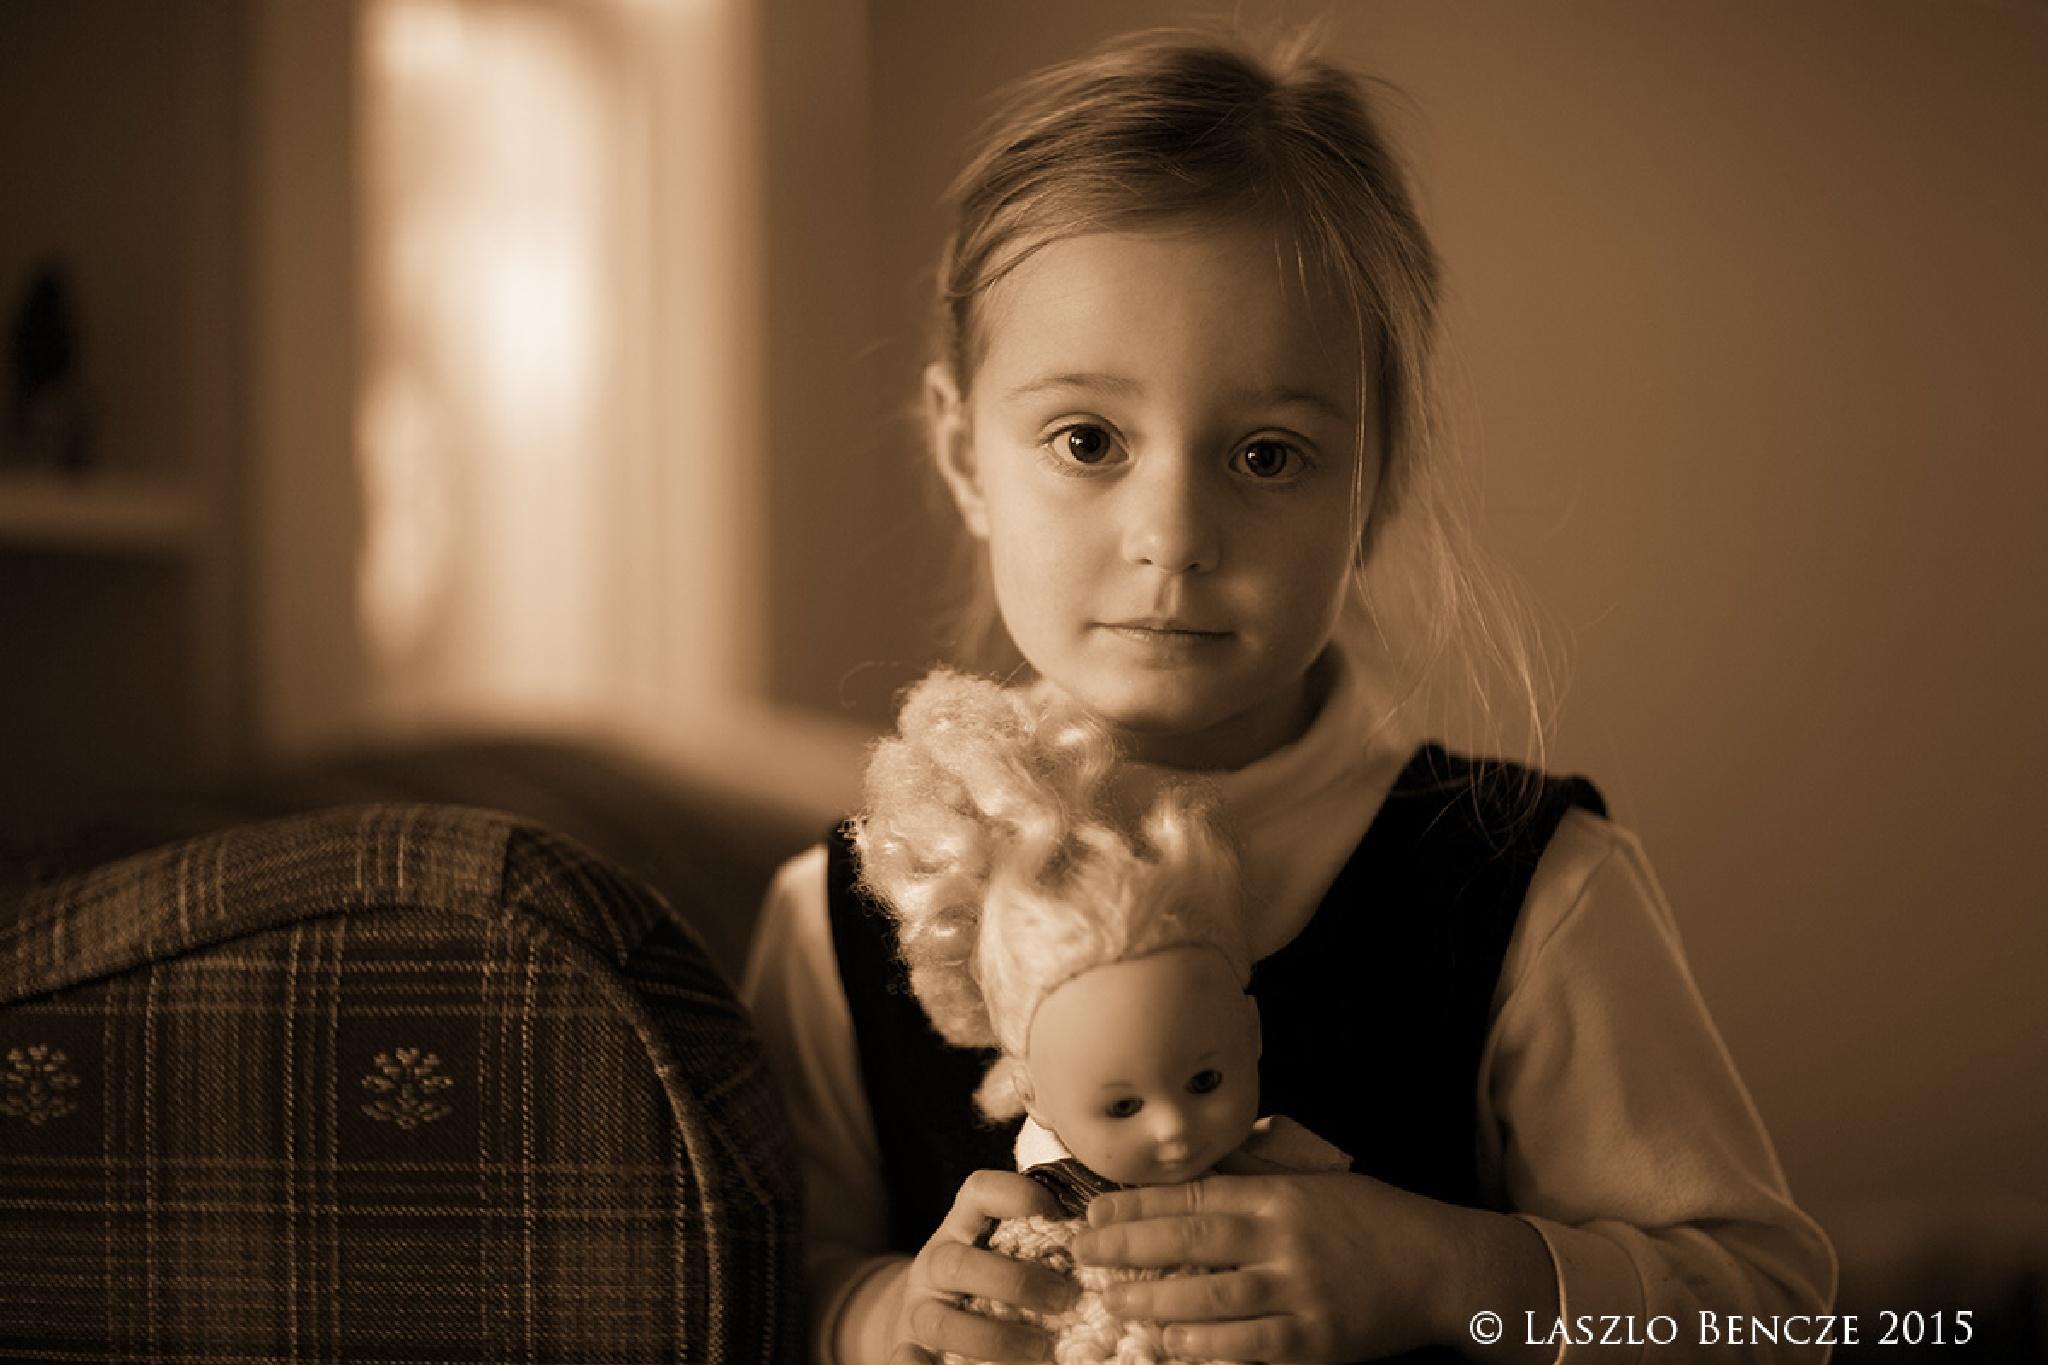 Girl with Doll by Laszlo Bencze